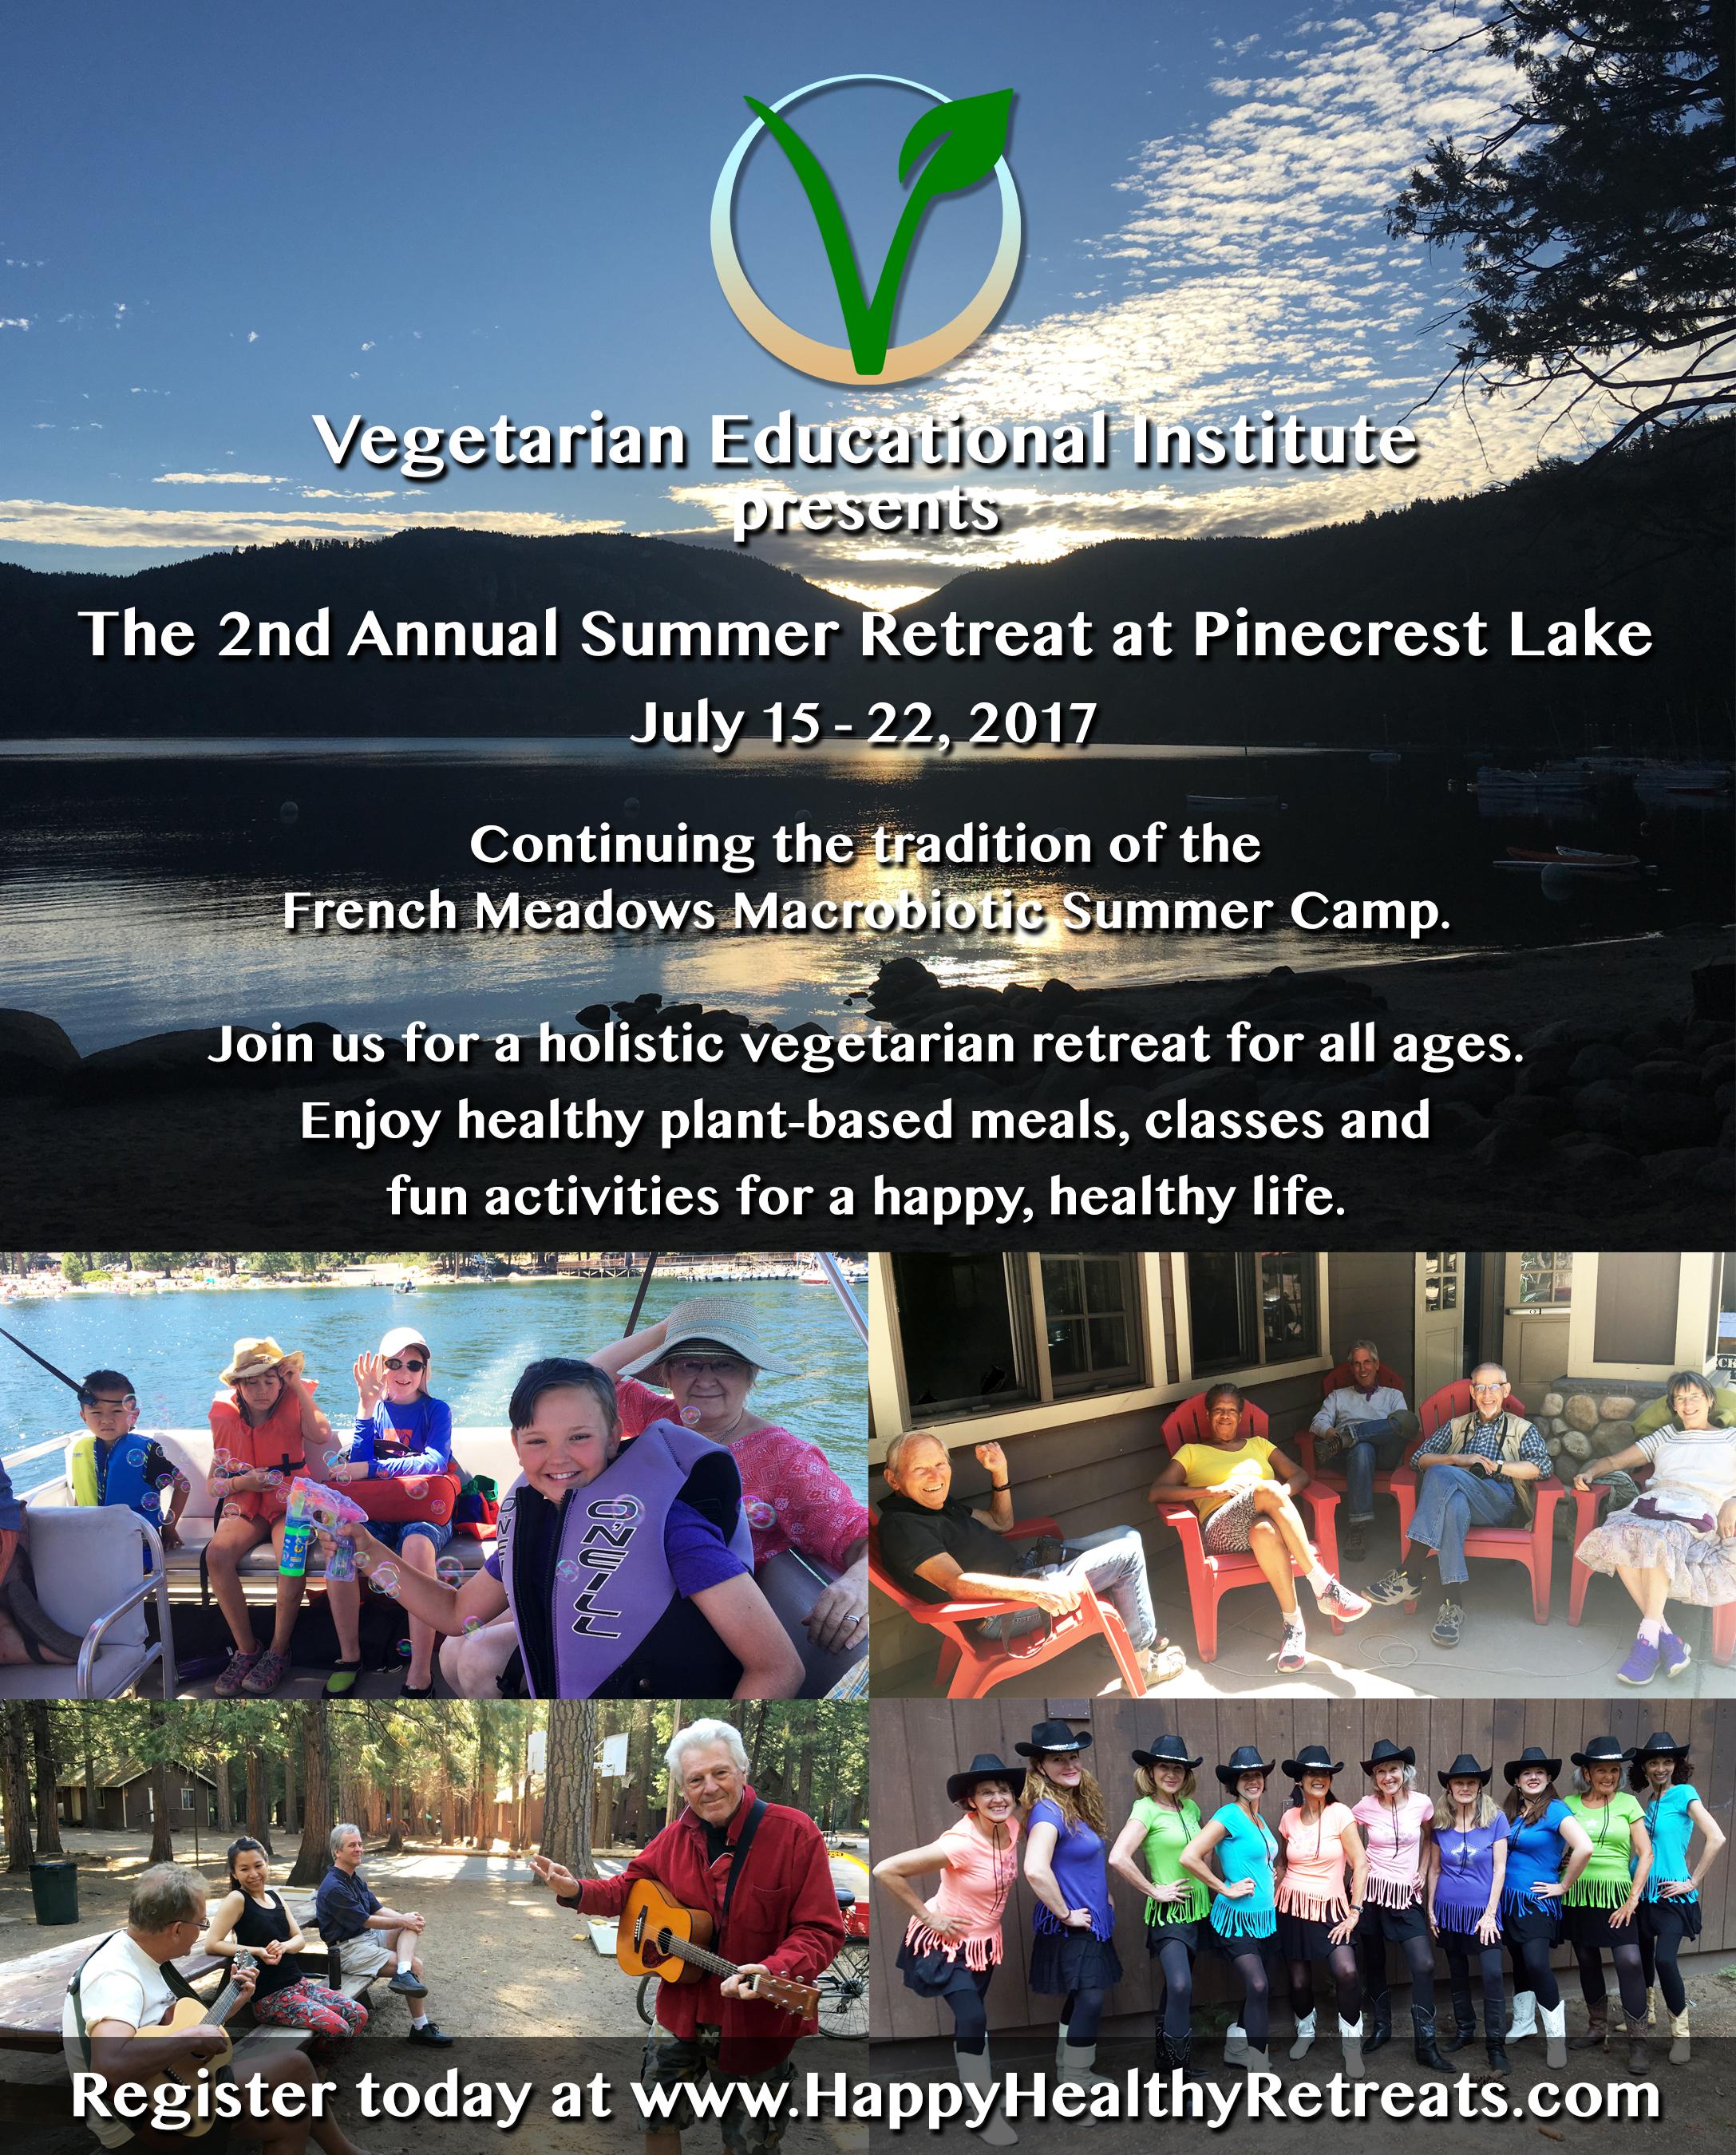 Vegetarian Educational Institute Summer Retreat 2017